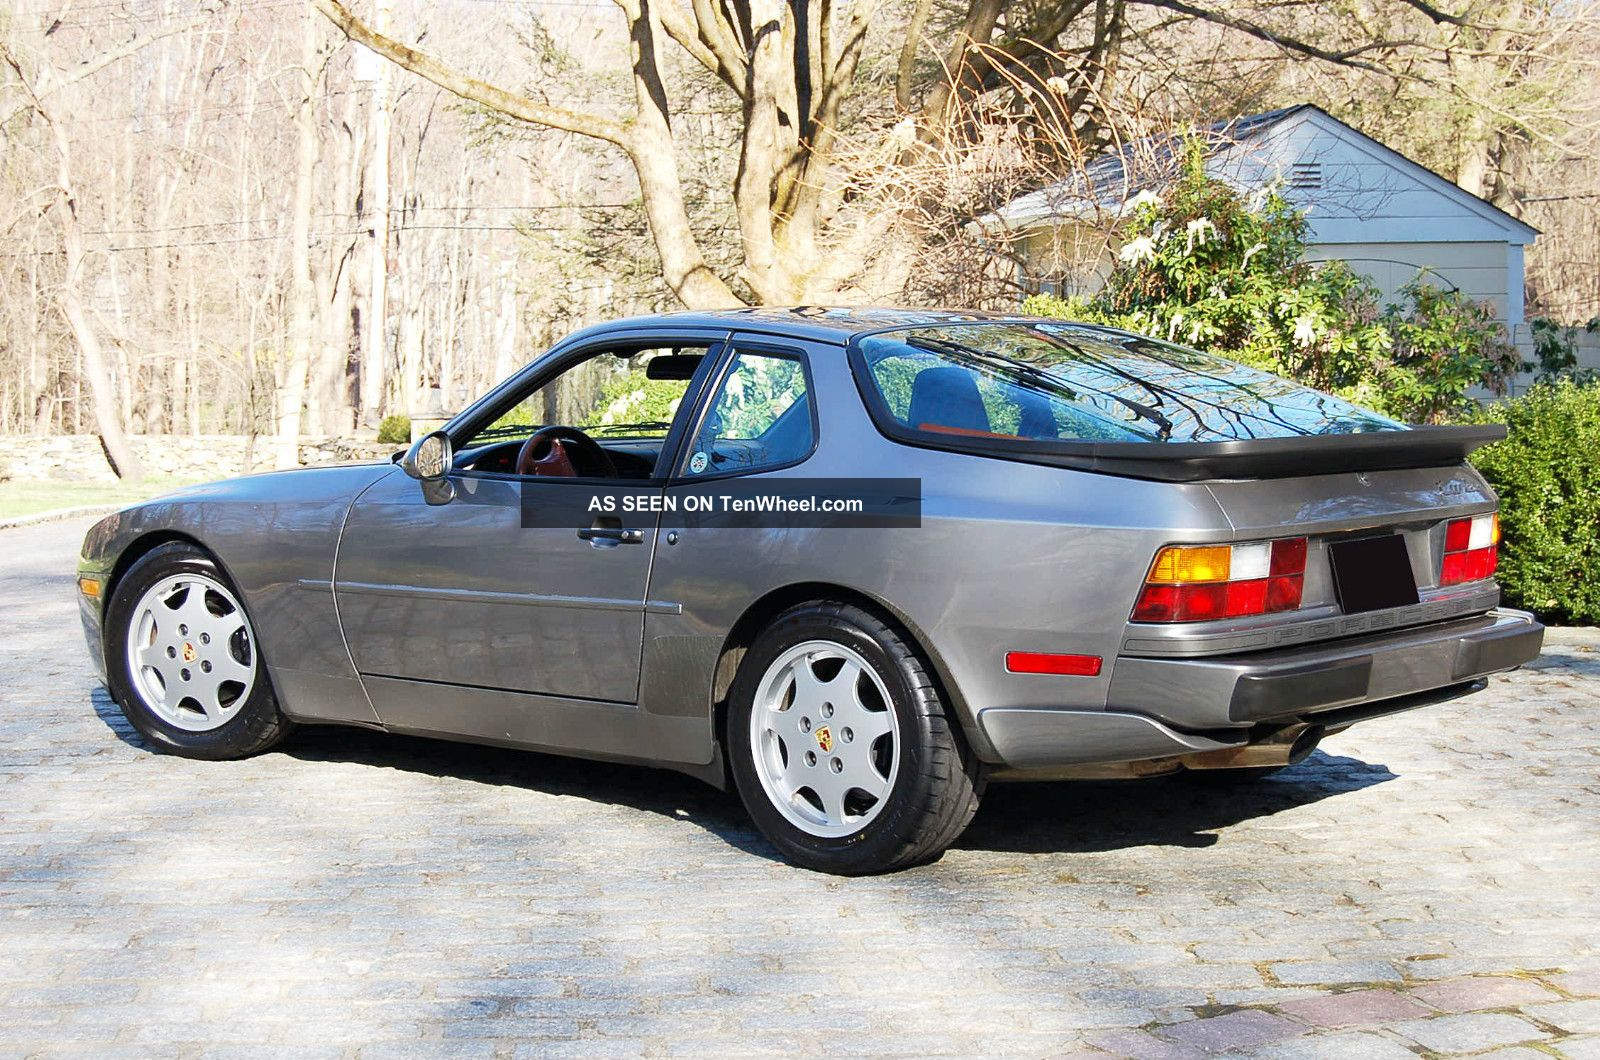 1987 Porsche 944 Turbo Coupe